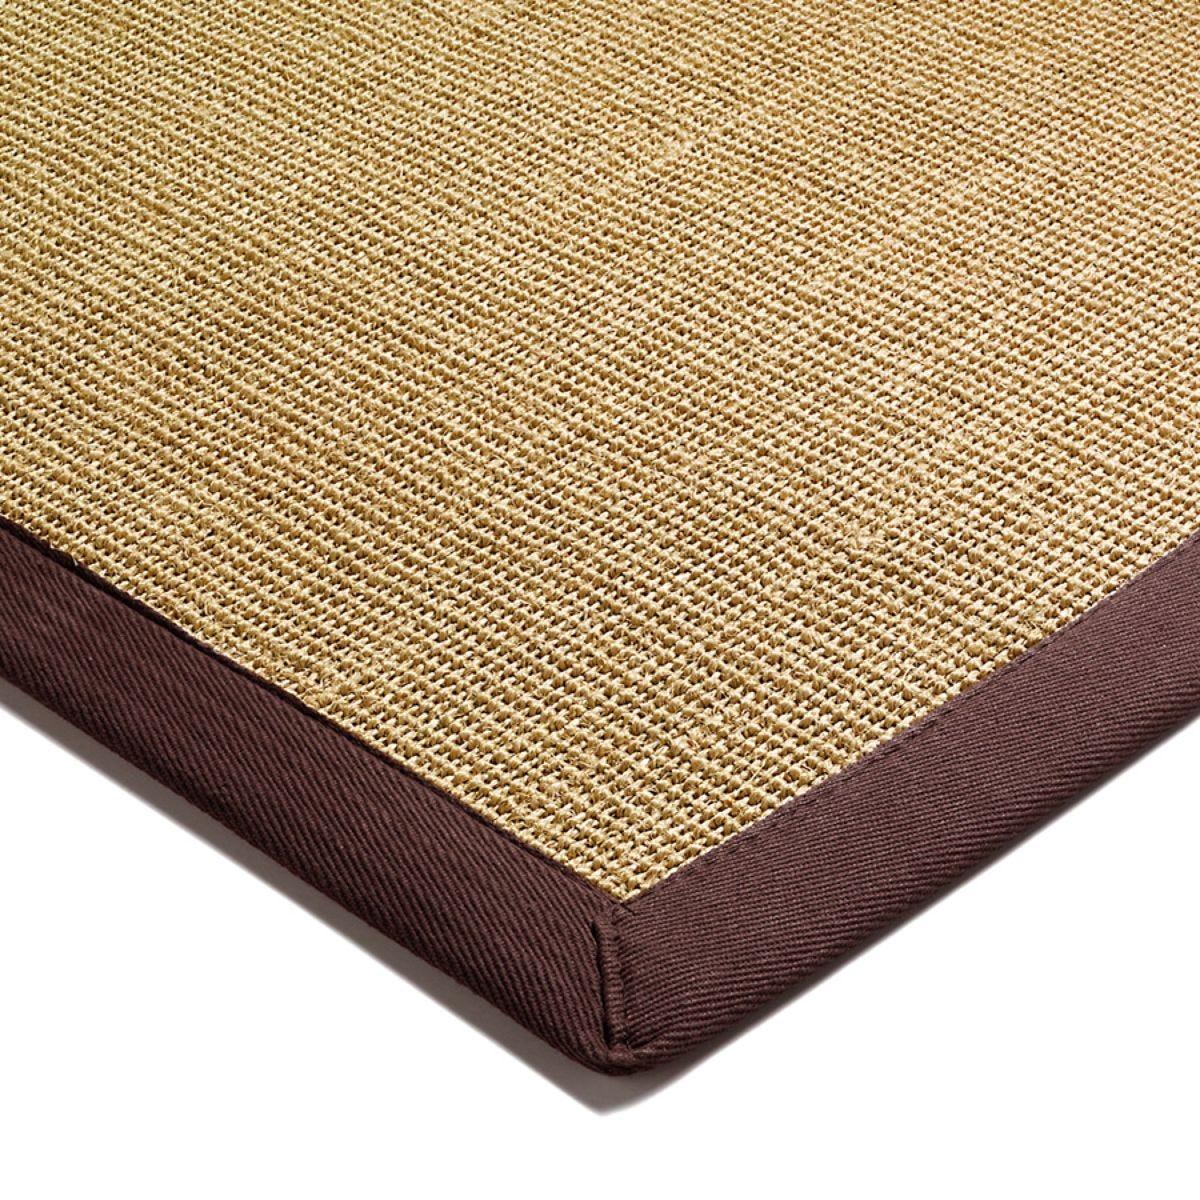 Asiatic Sisal Rug 180 x 120cm - Chocolate